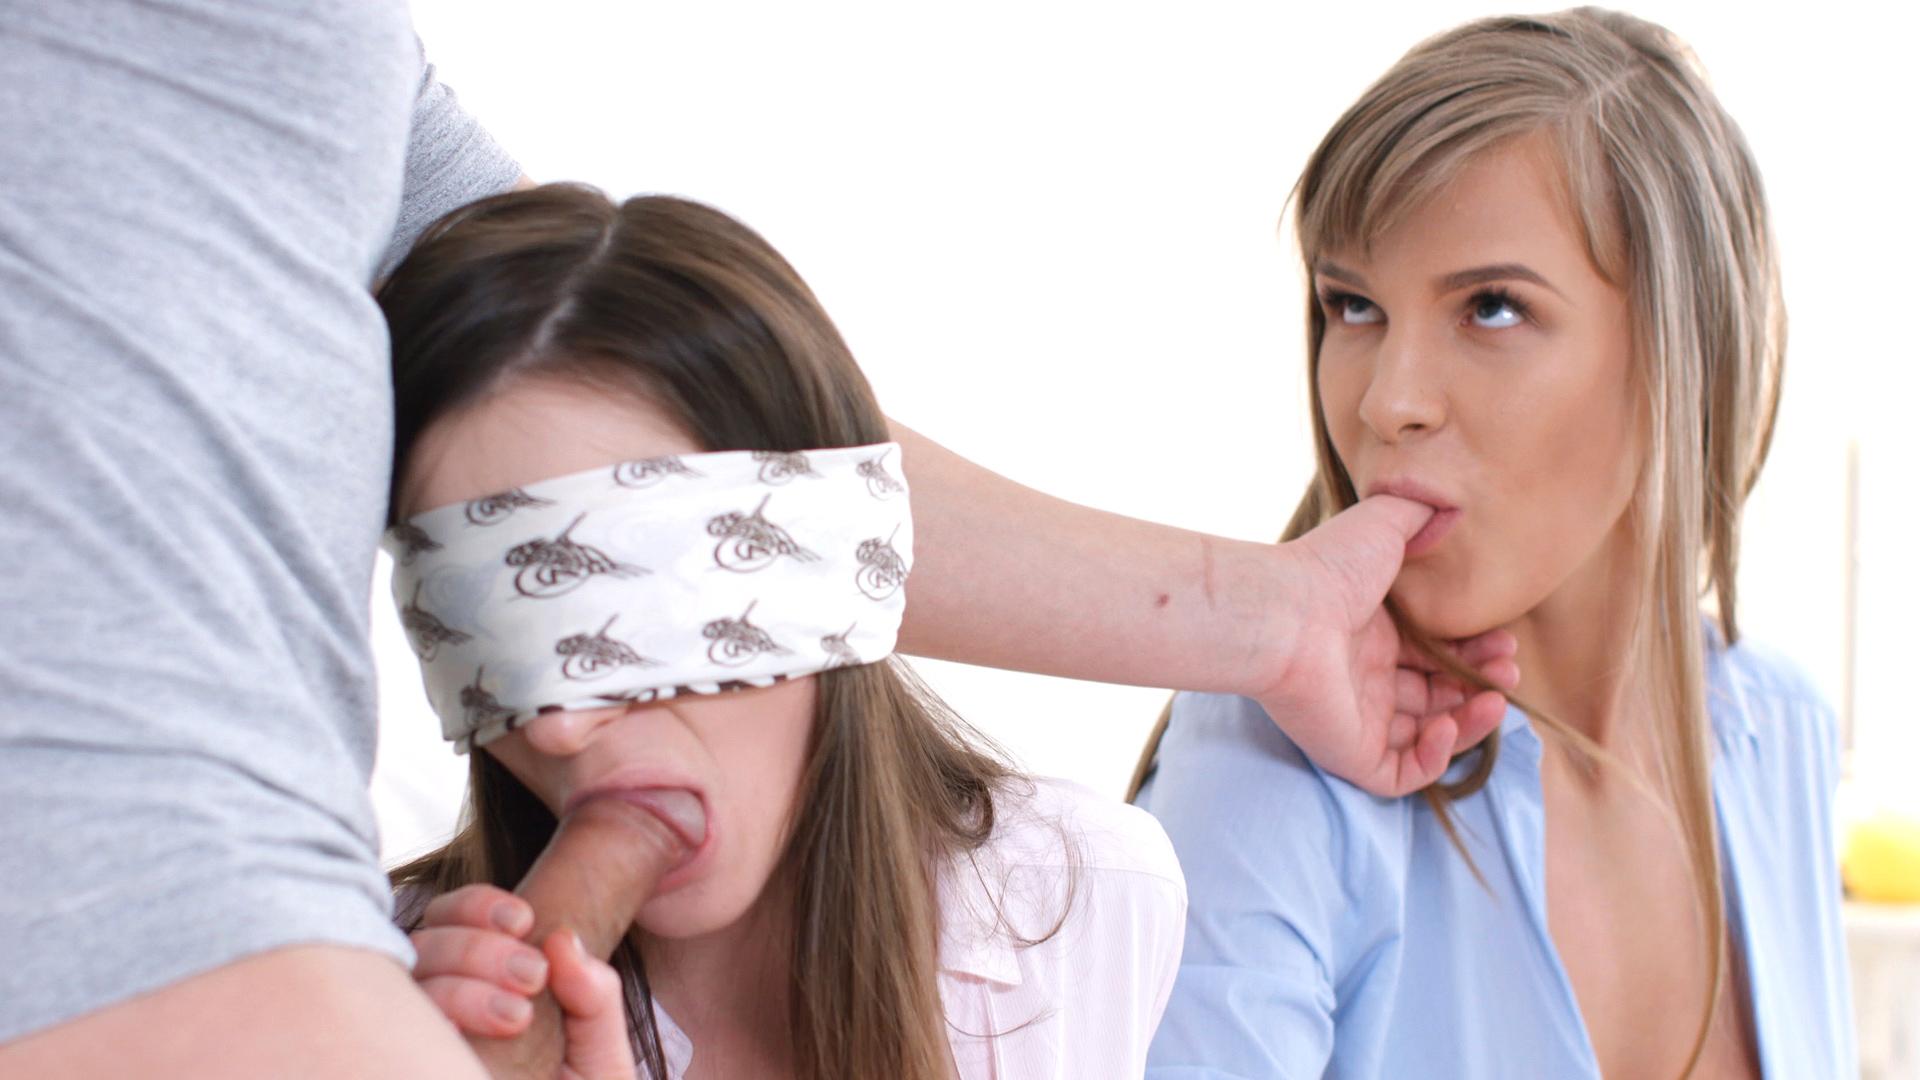 Sharing Beef Whistle With Girl/girl Girlfriend